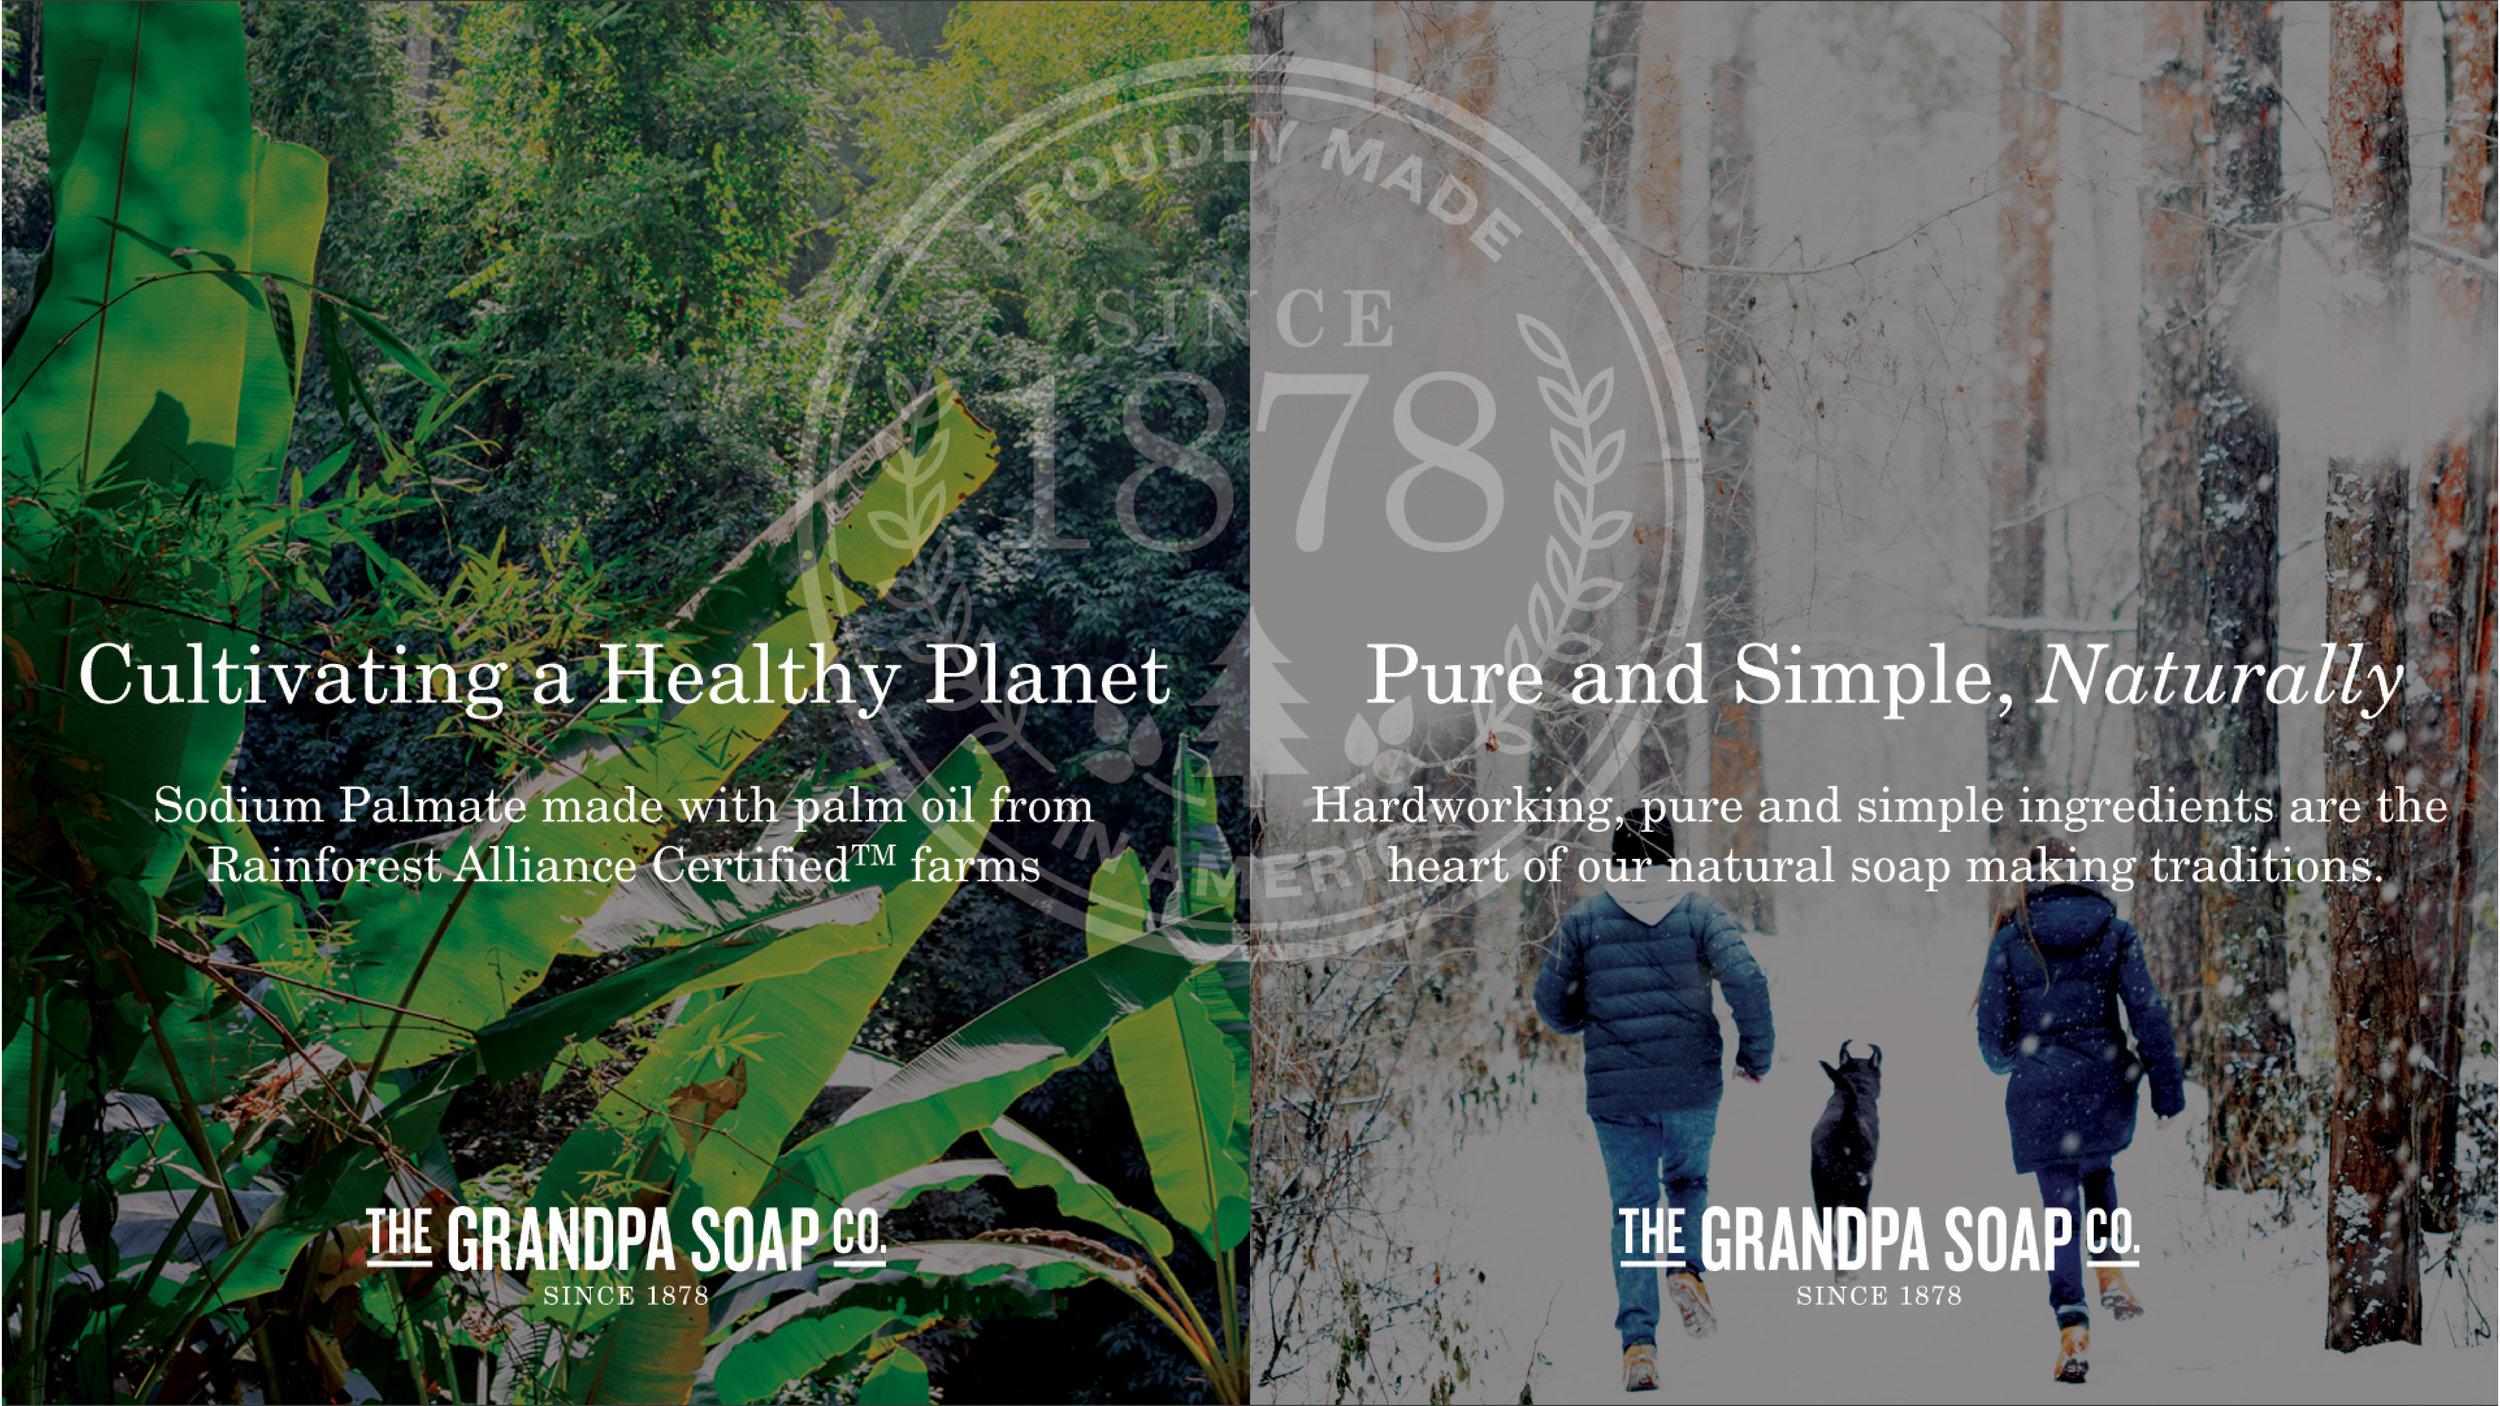 2017 AMA Pinnacle - Sund Co Slides3.jpg